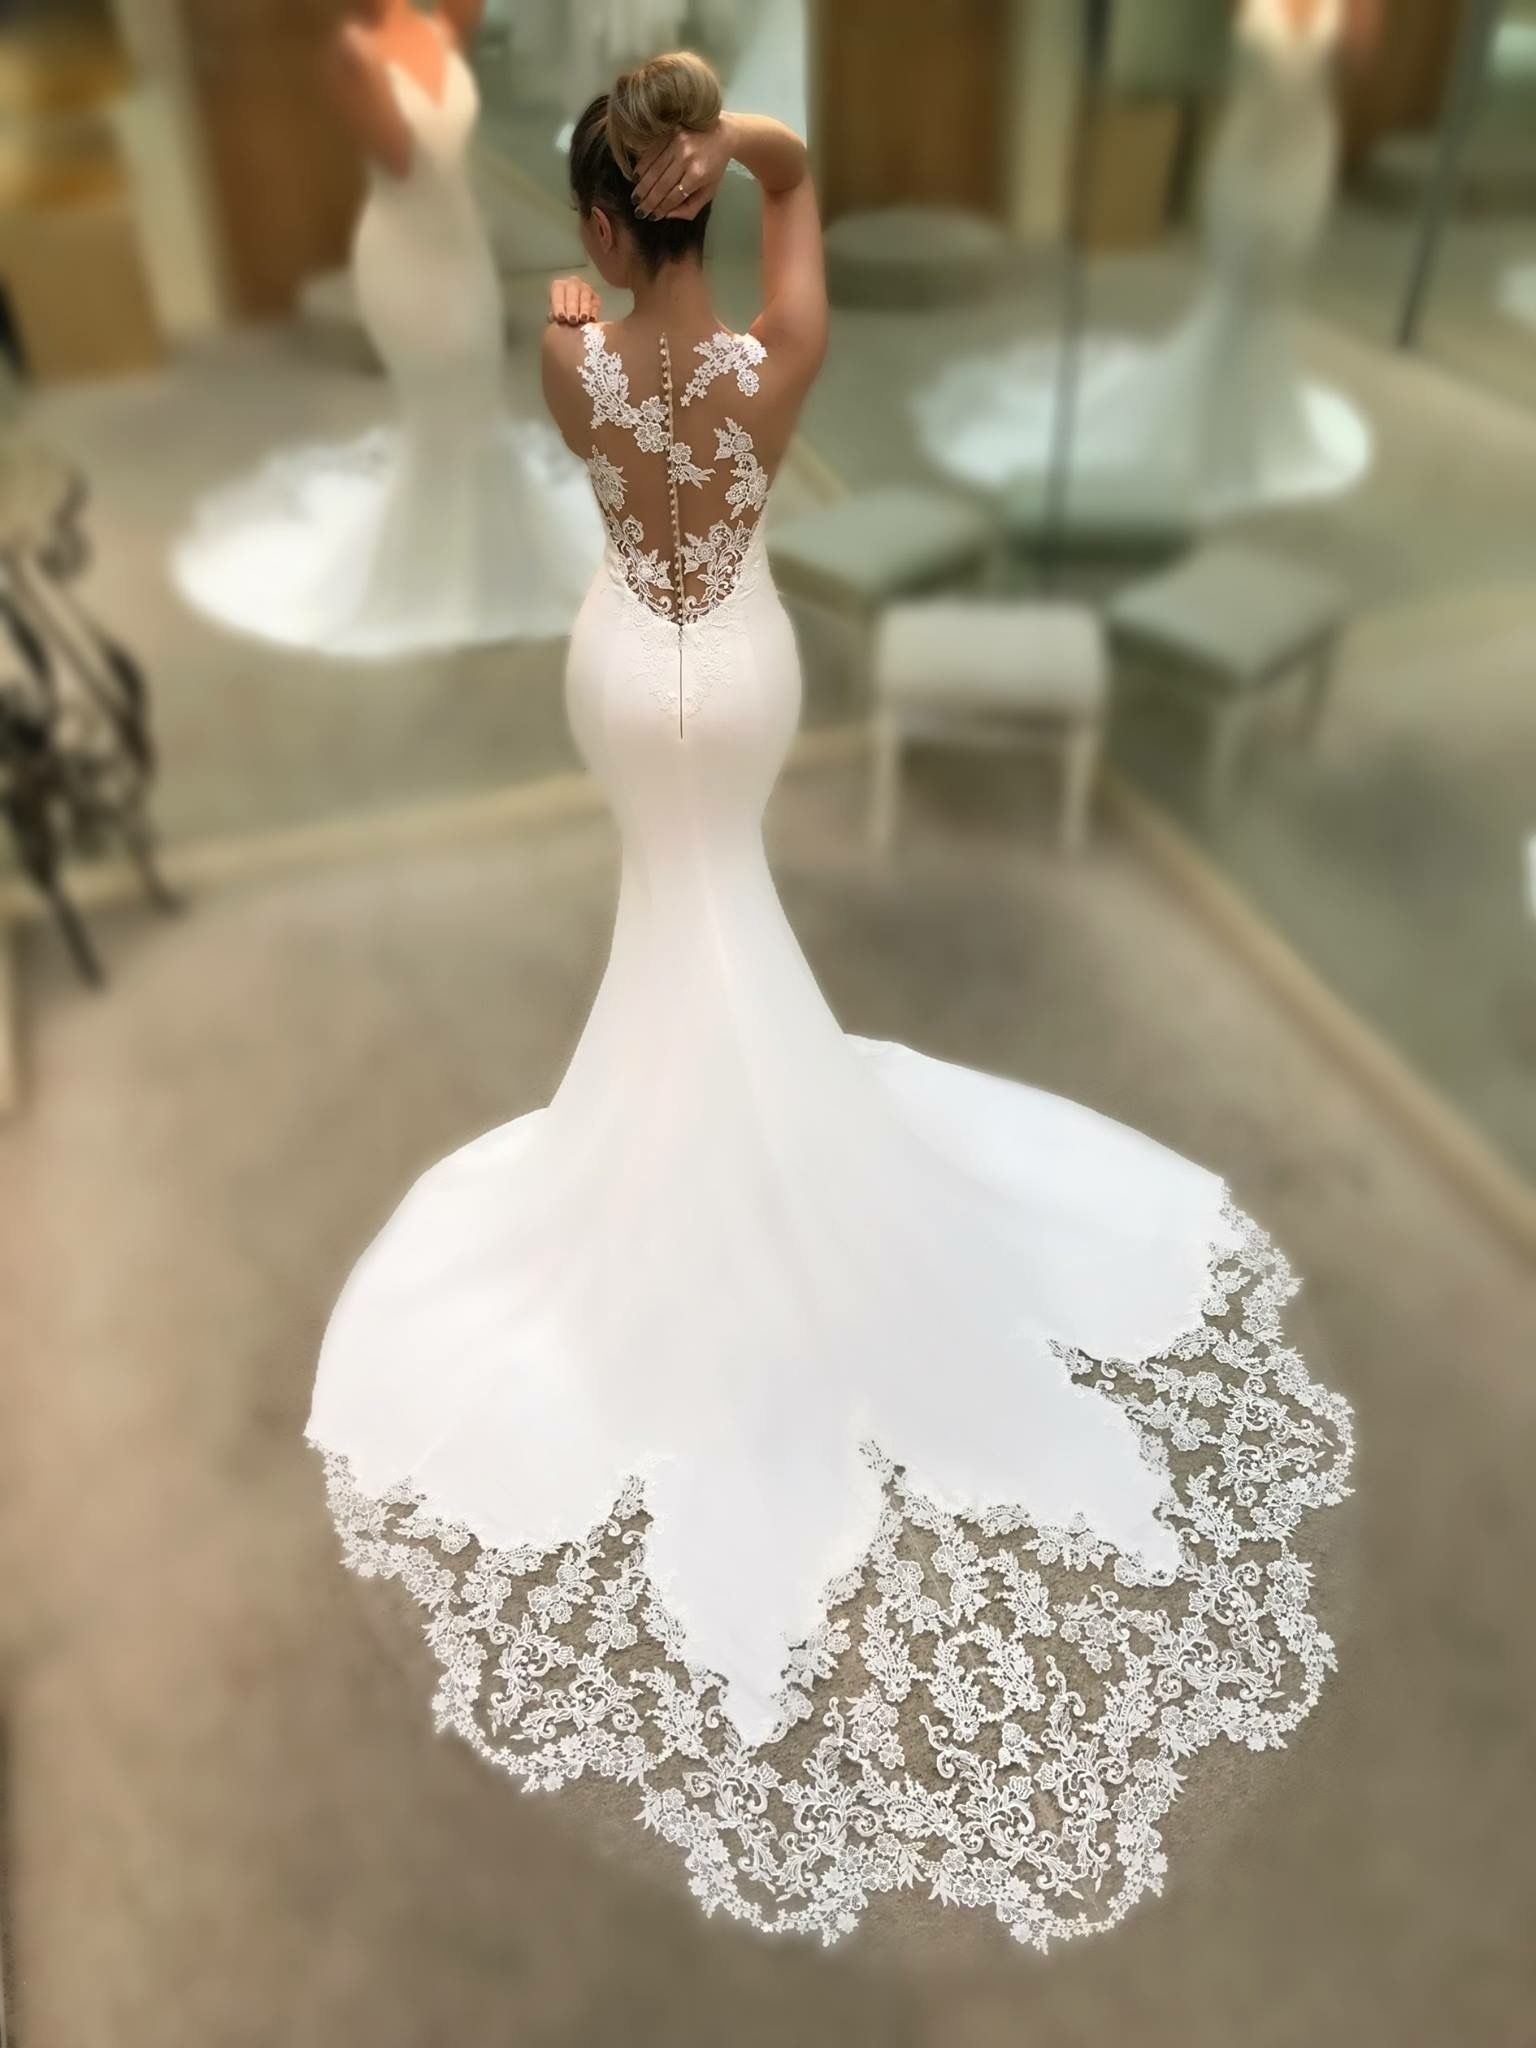 Kalypso Enzoani Blue Collection Lace Mermaid Wedding Dress Wedding Dresses Affordable Wedding Dress Designers [ 2048 x 1536 Pixel ]